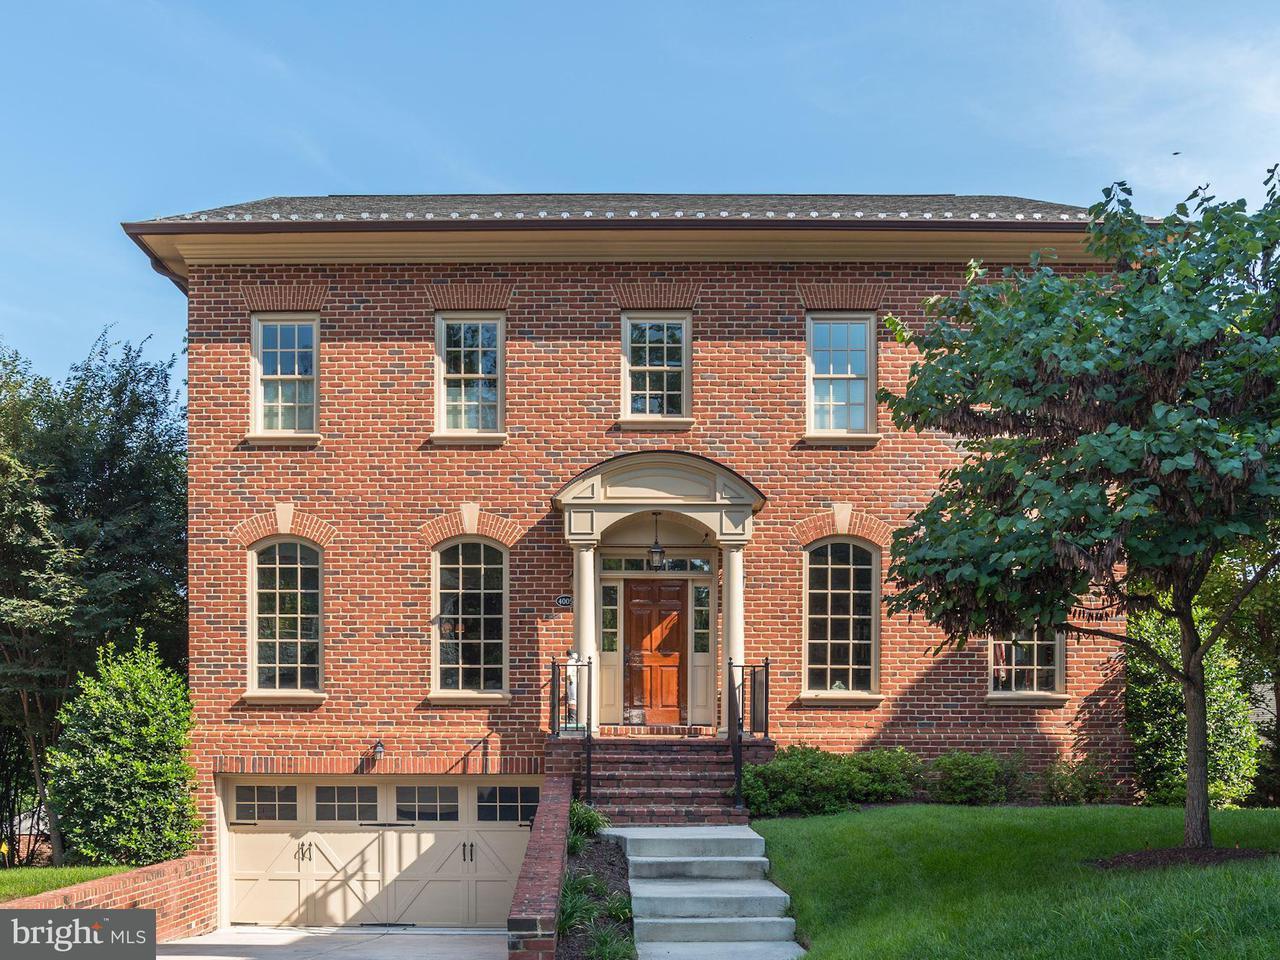 Single Family Home for Sale at 4005 Richmond Street 4005 Richmond Street Arlington, Virginia 22207 United States